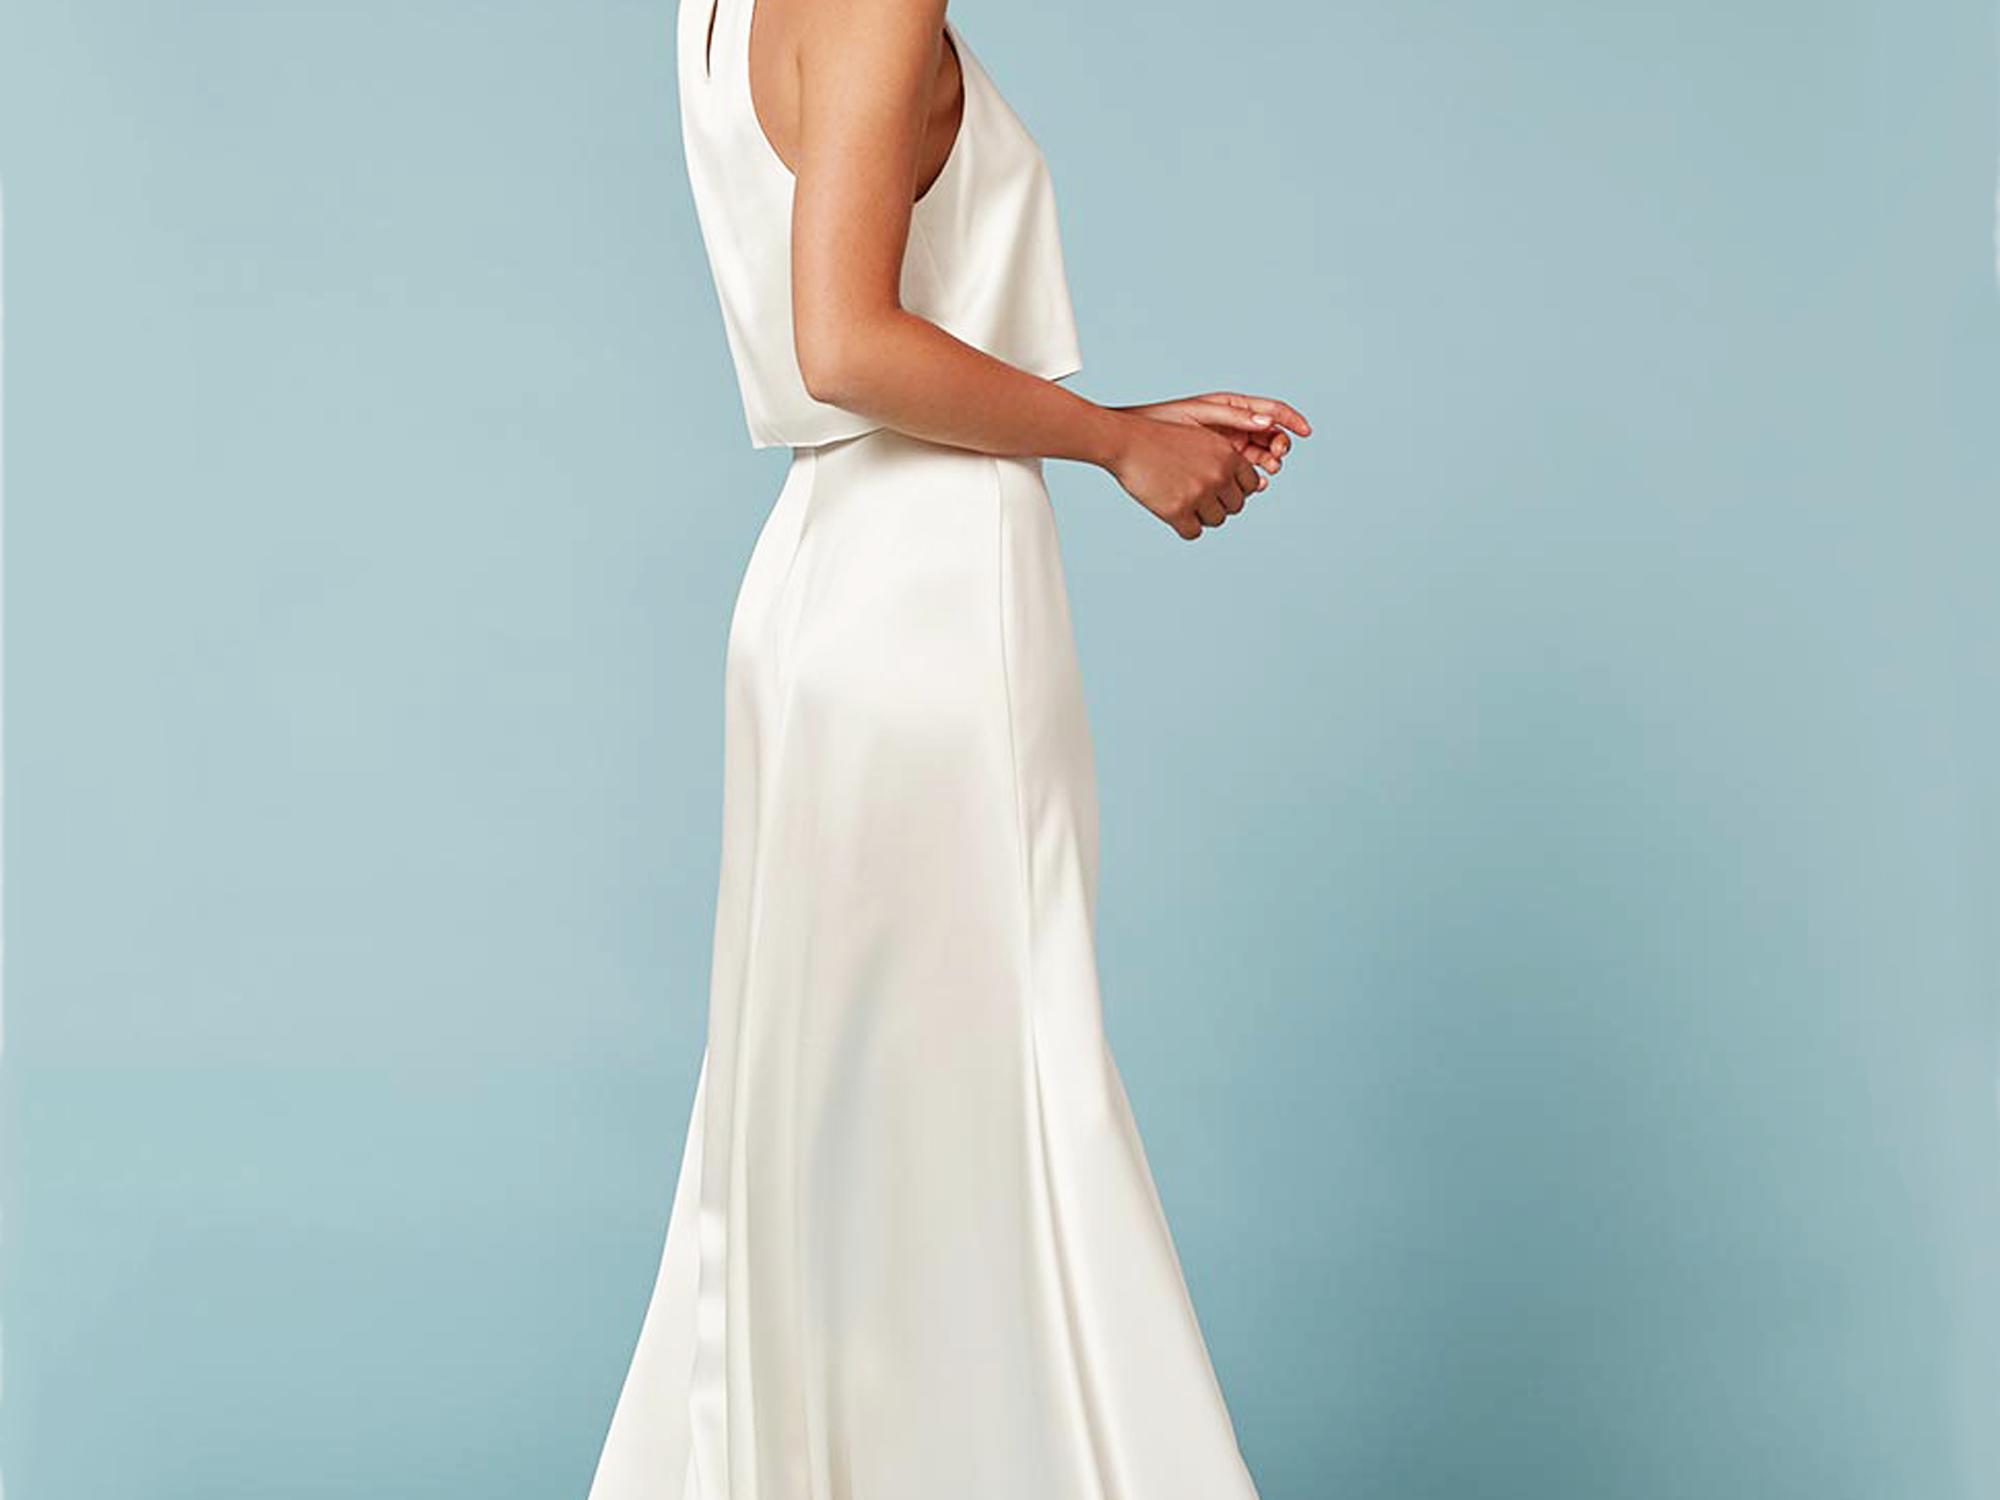 Reformation Wedding Dress — Affordable Wedding Dresses